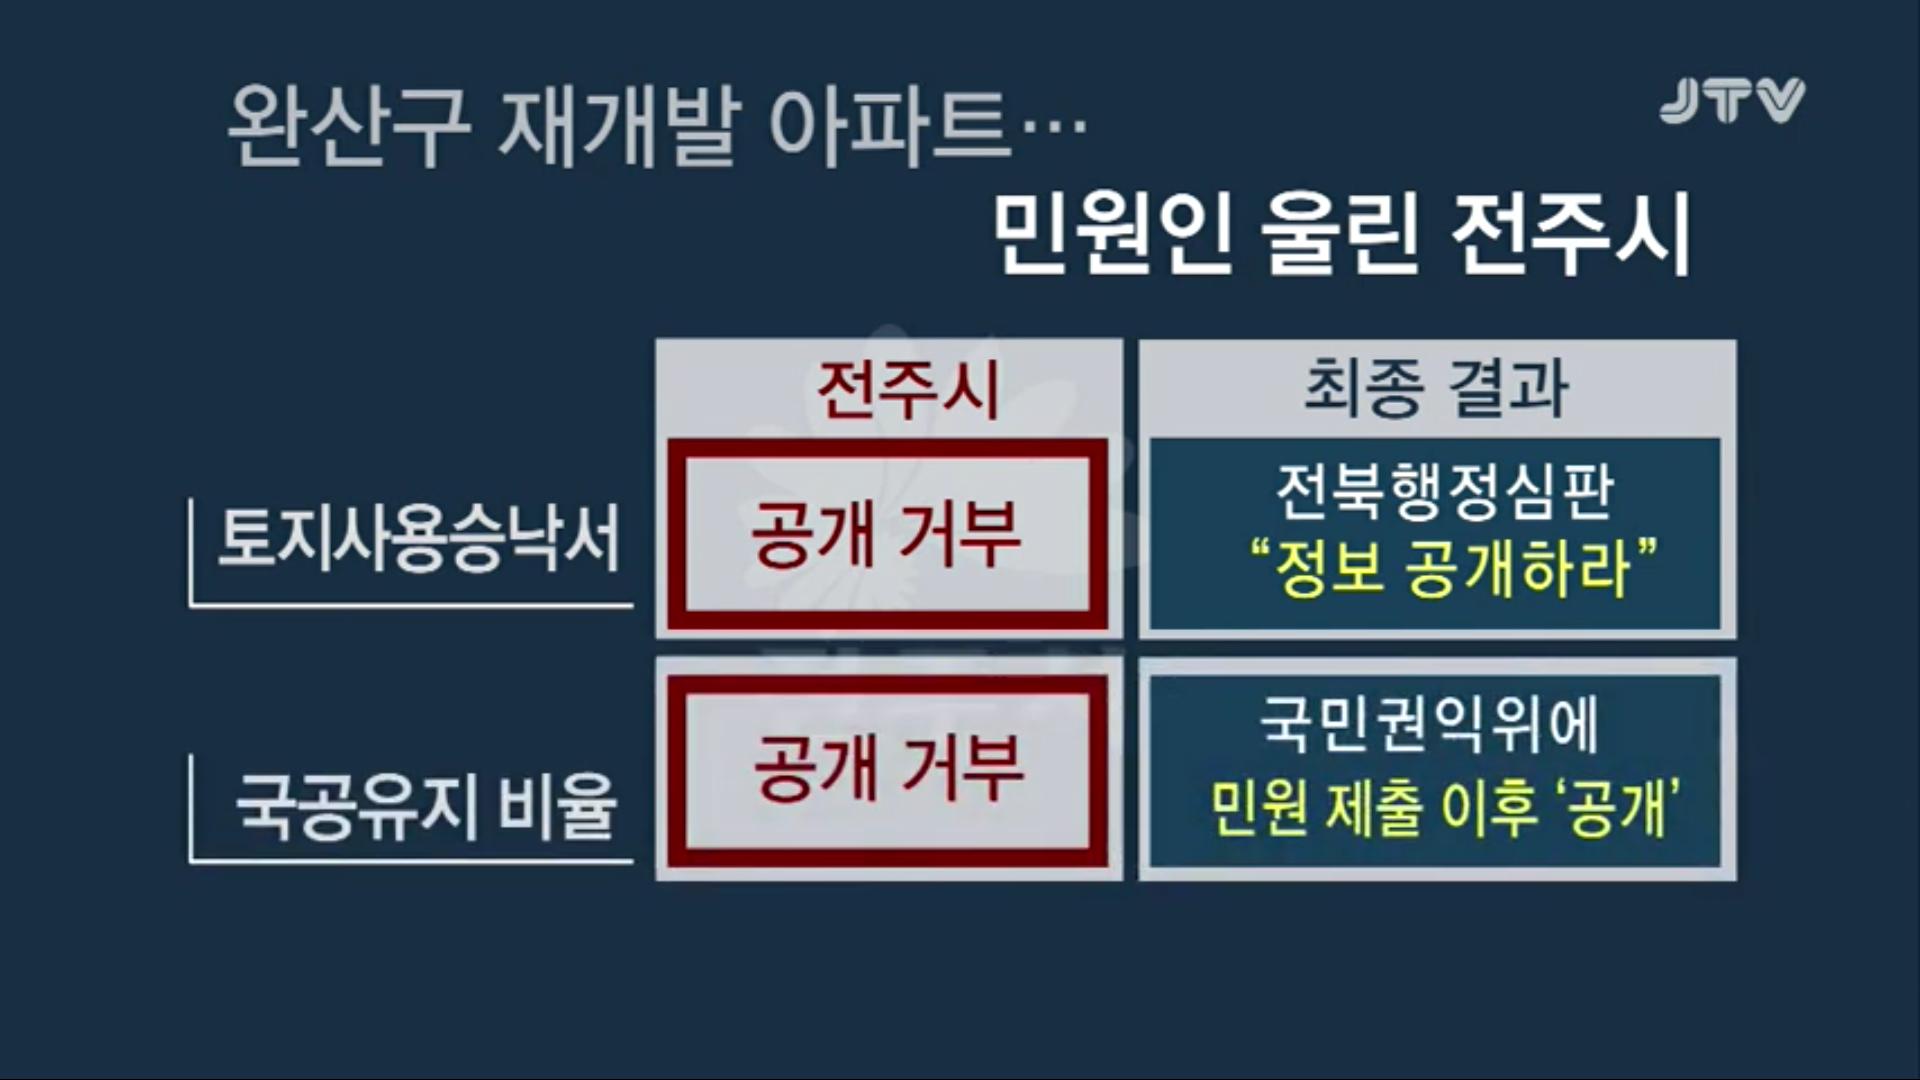 [19.5.3 JTV 현장스토리 판] 고소, 고발 당한 전주시장... 미심쩍은 건축행정5.png